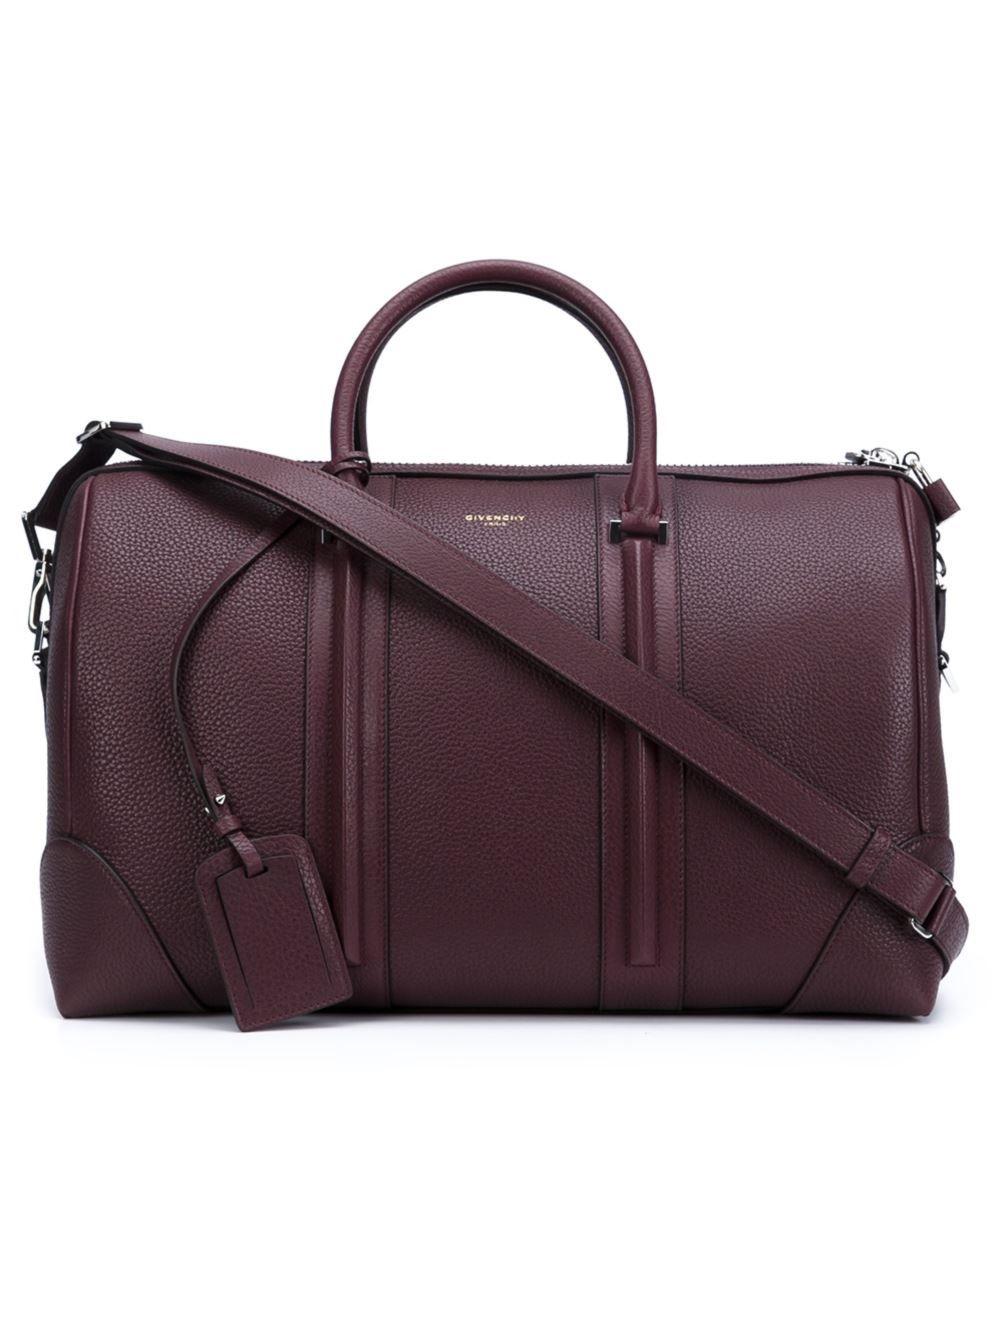 Givenchy  Lucrezia  holdall Givenchy Sale b55e44bde6a47